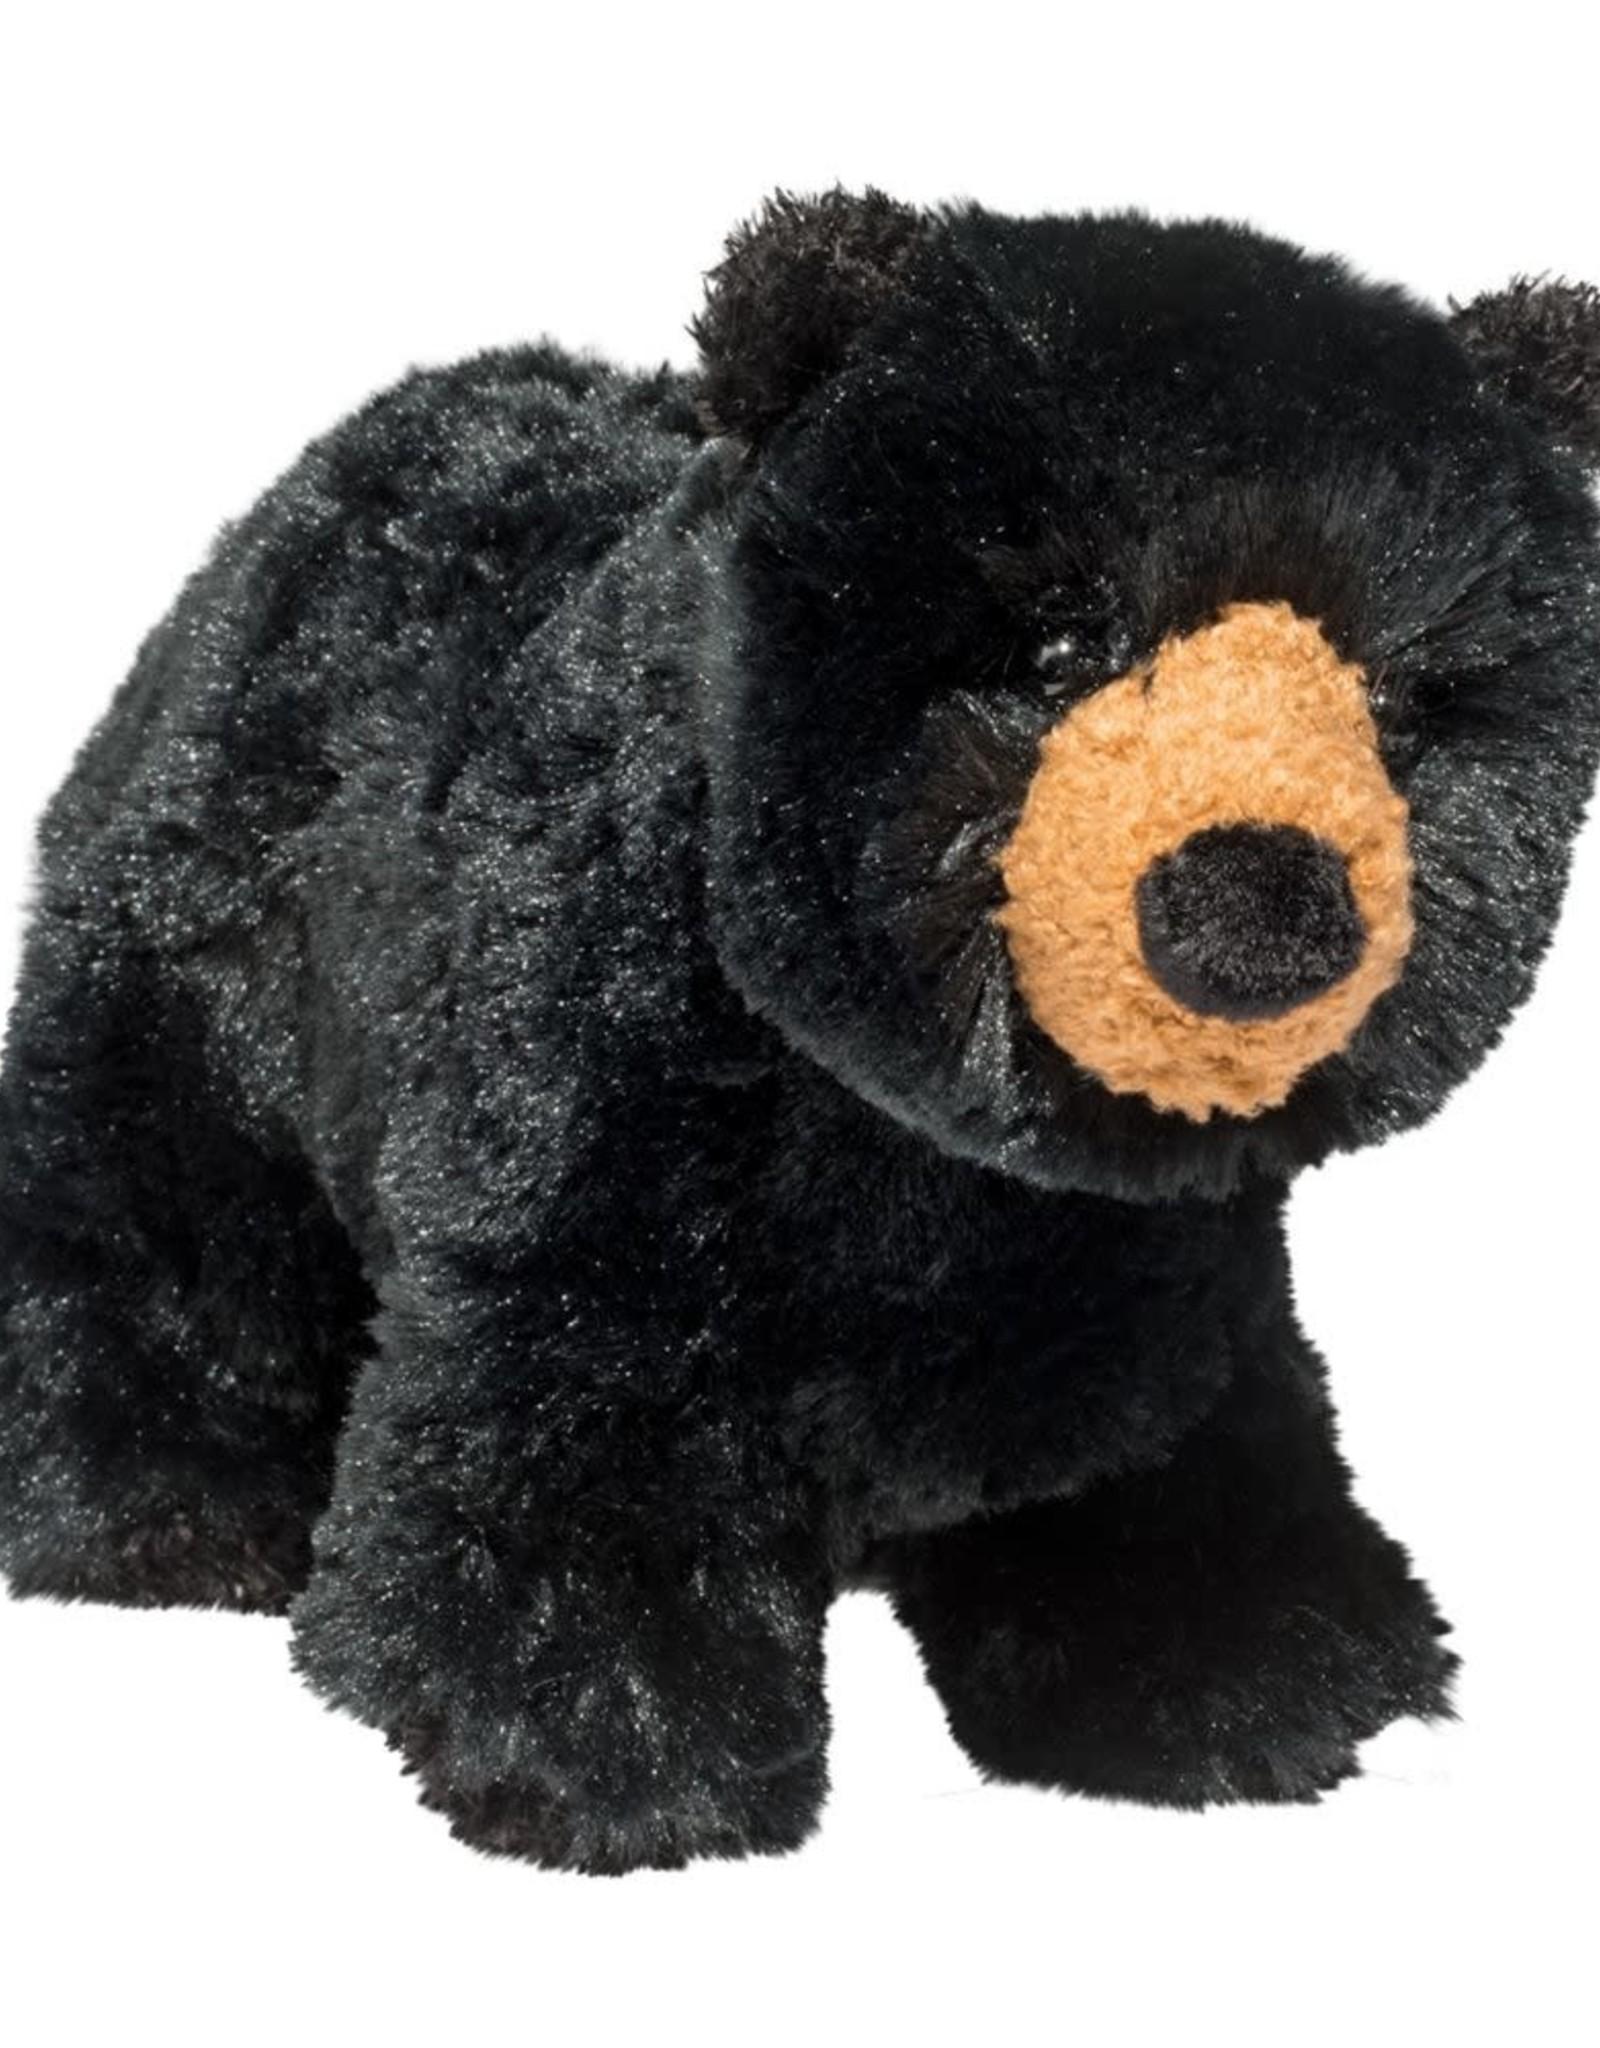 Douglas Toys Charcoal Black Bear